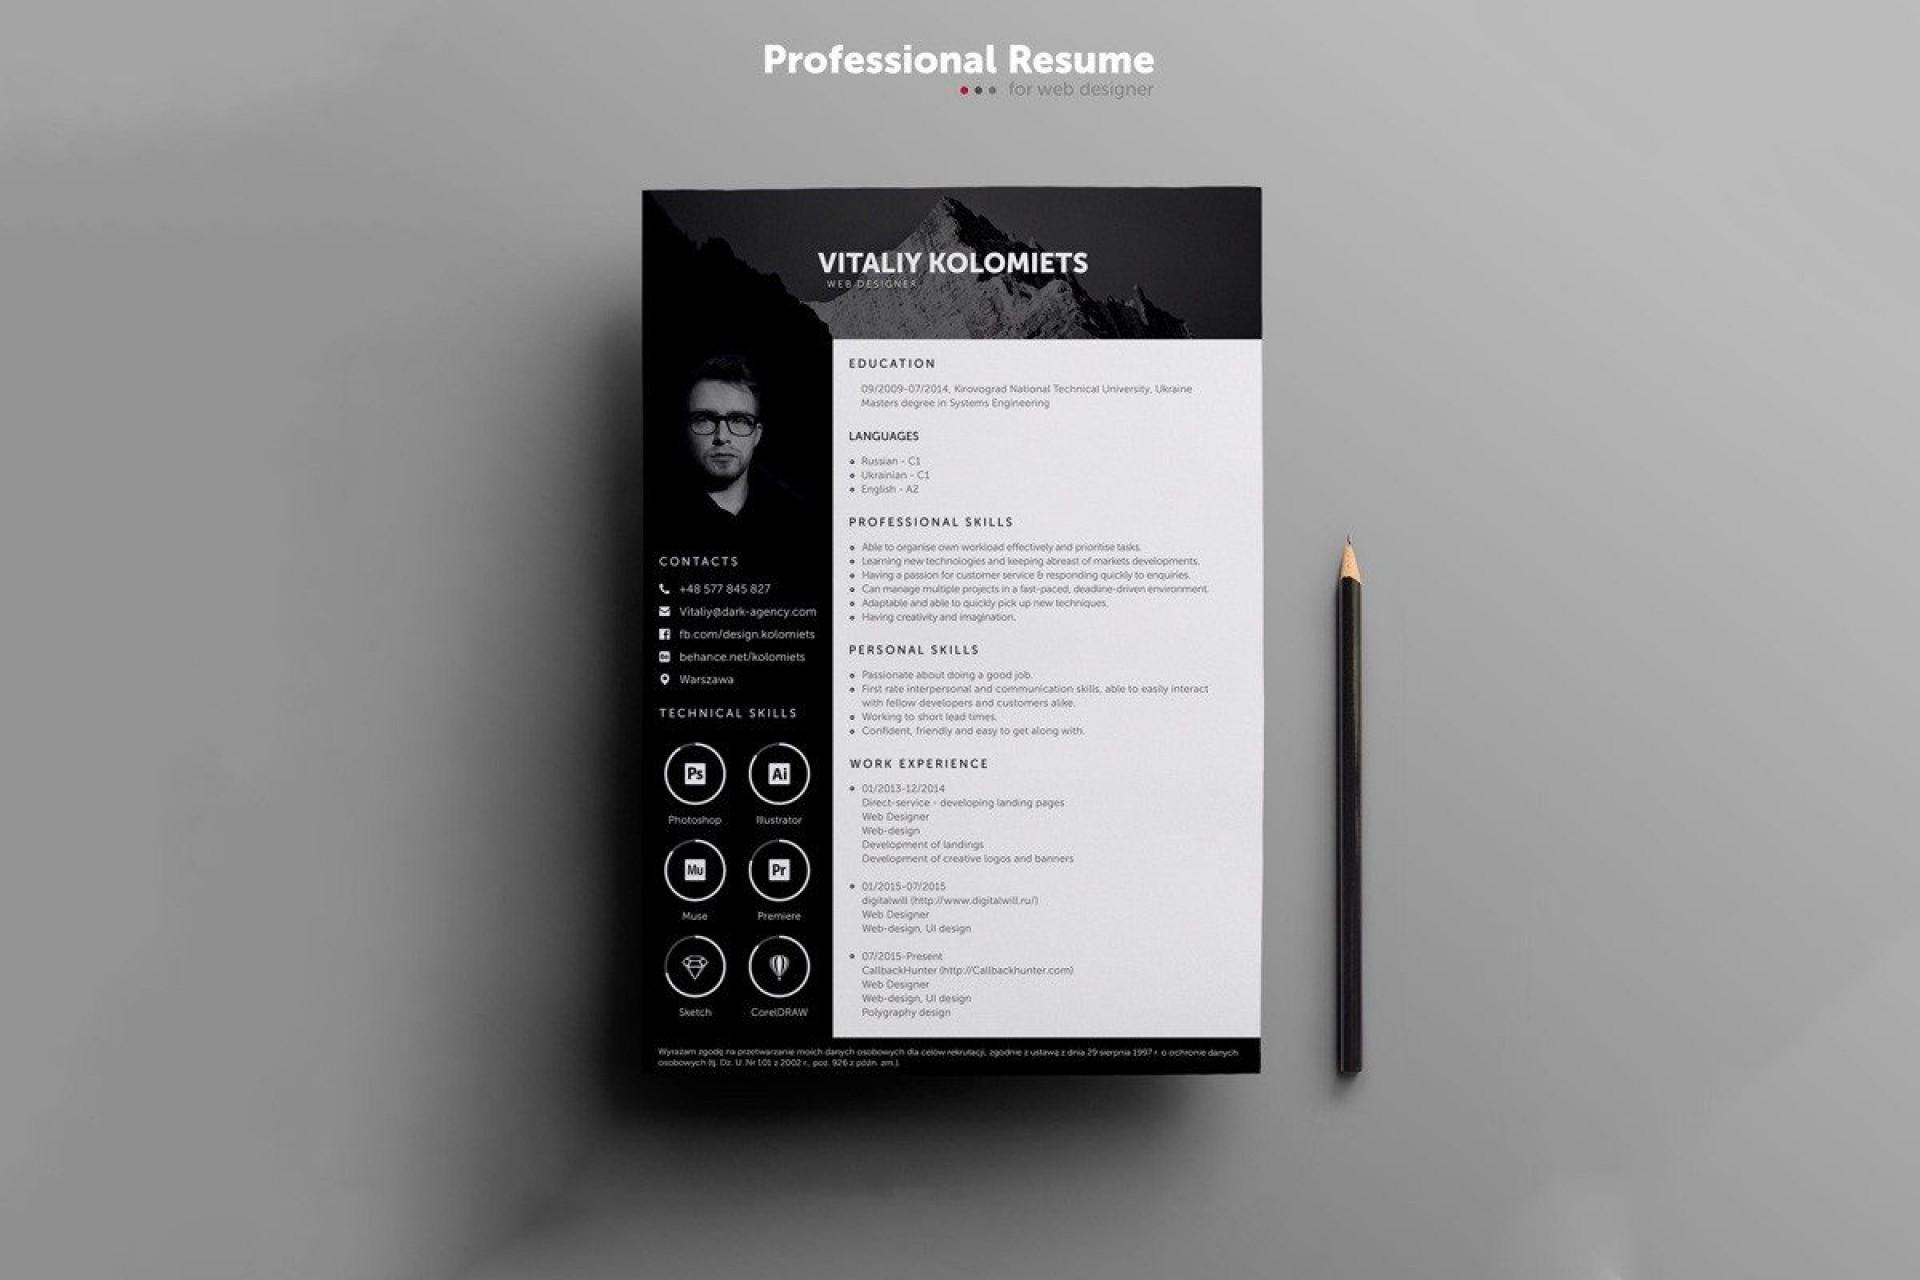 000 Fascinating Free Resume Template 2015 Photo 1920